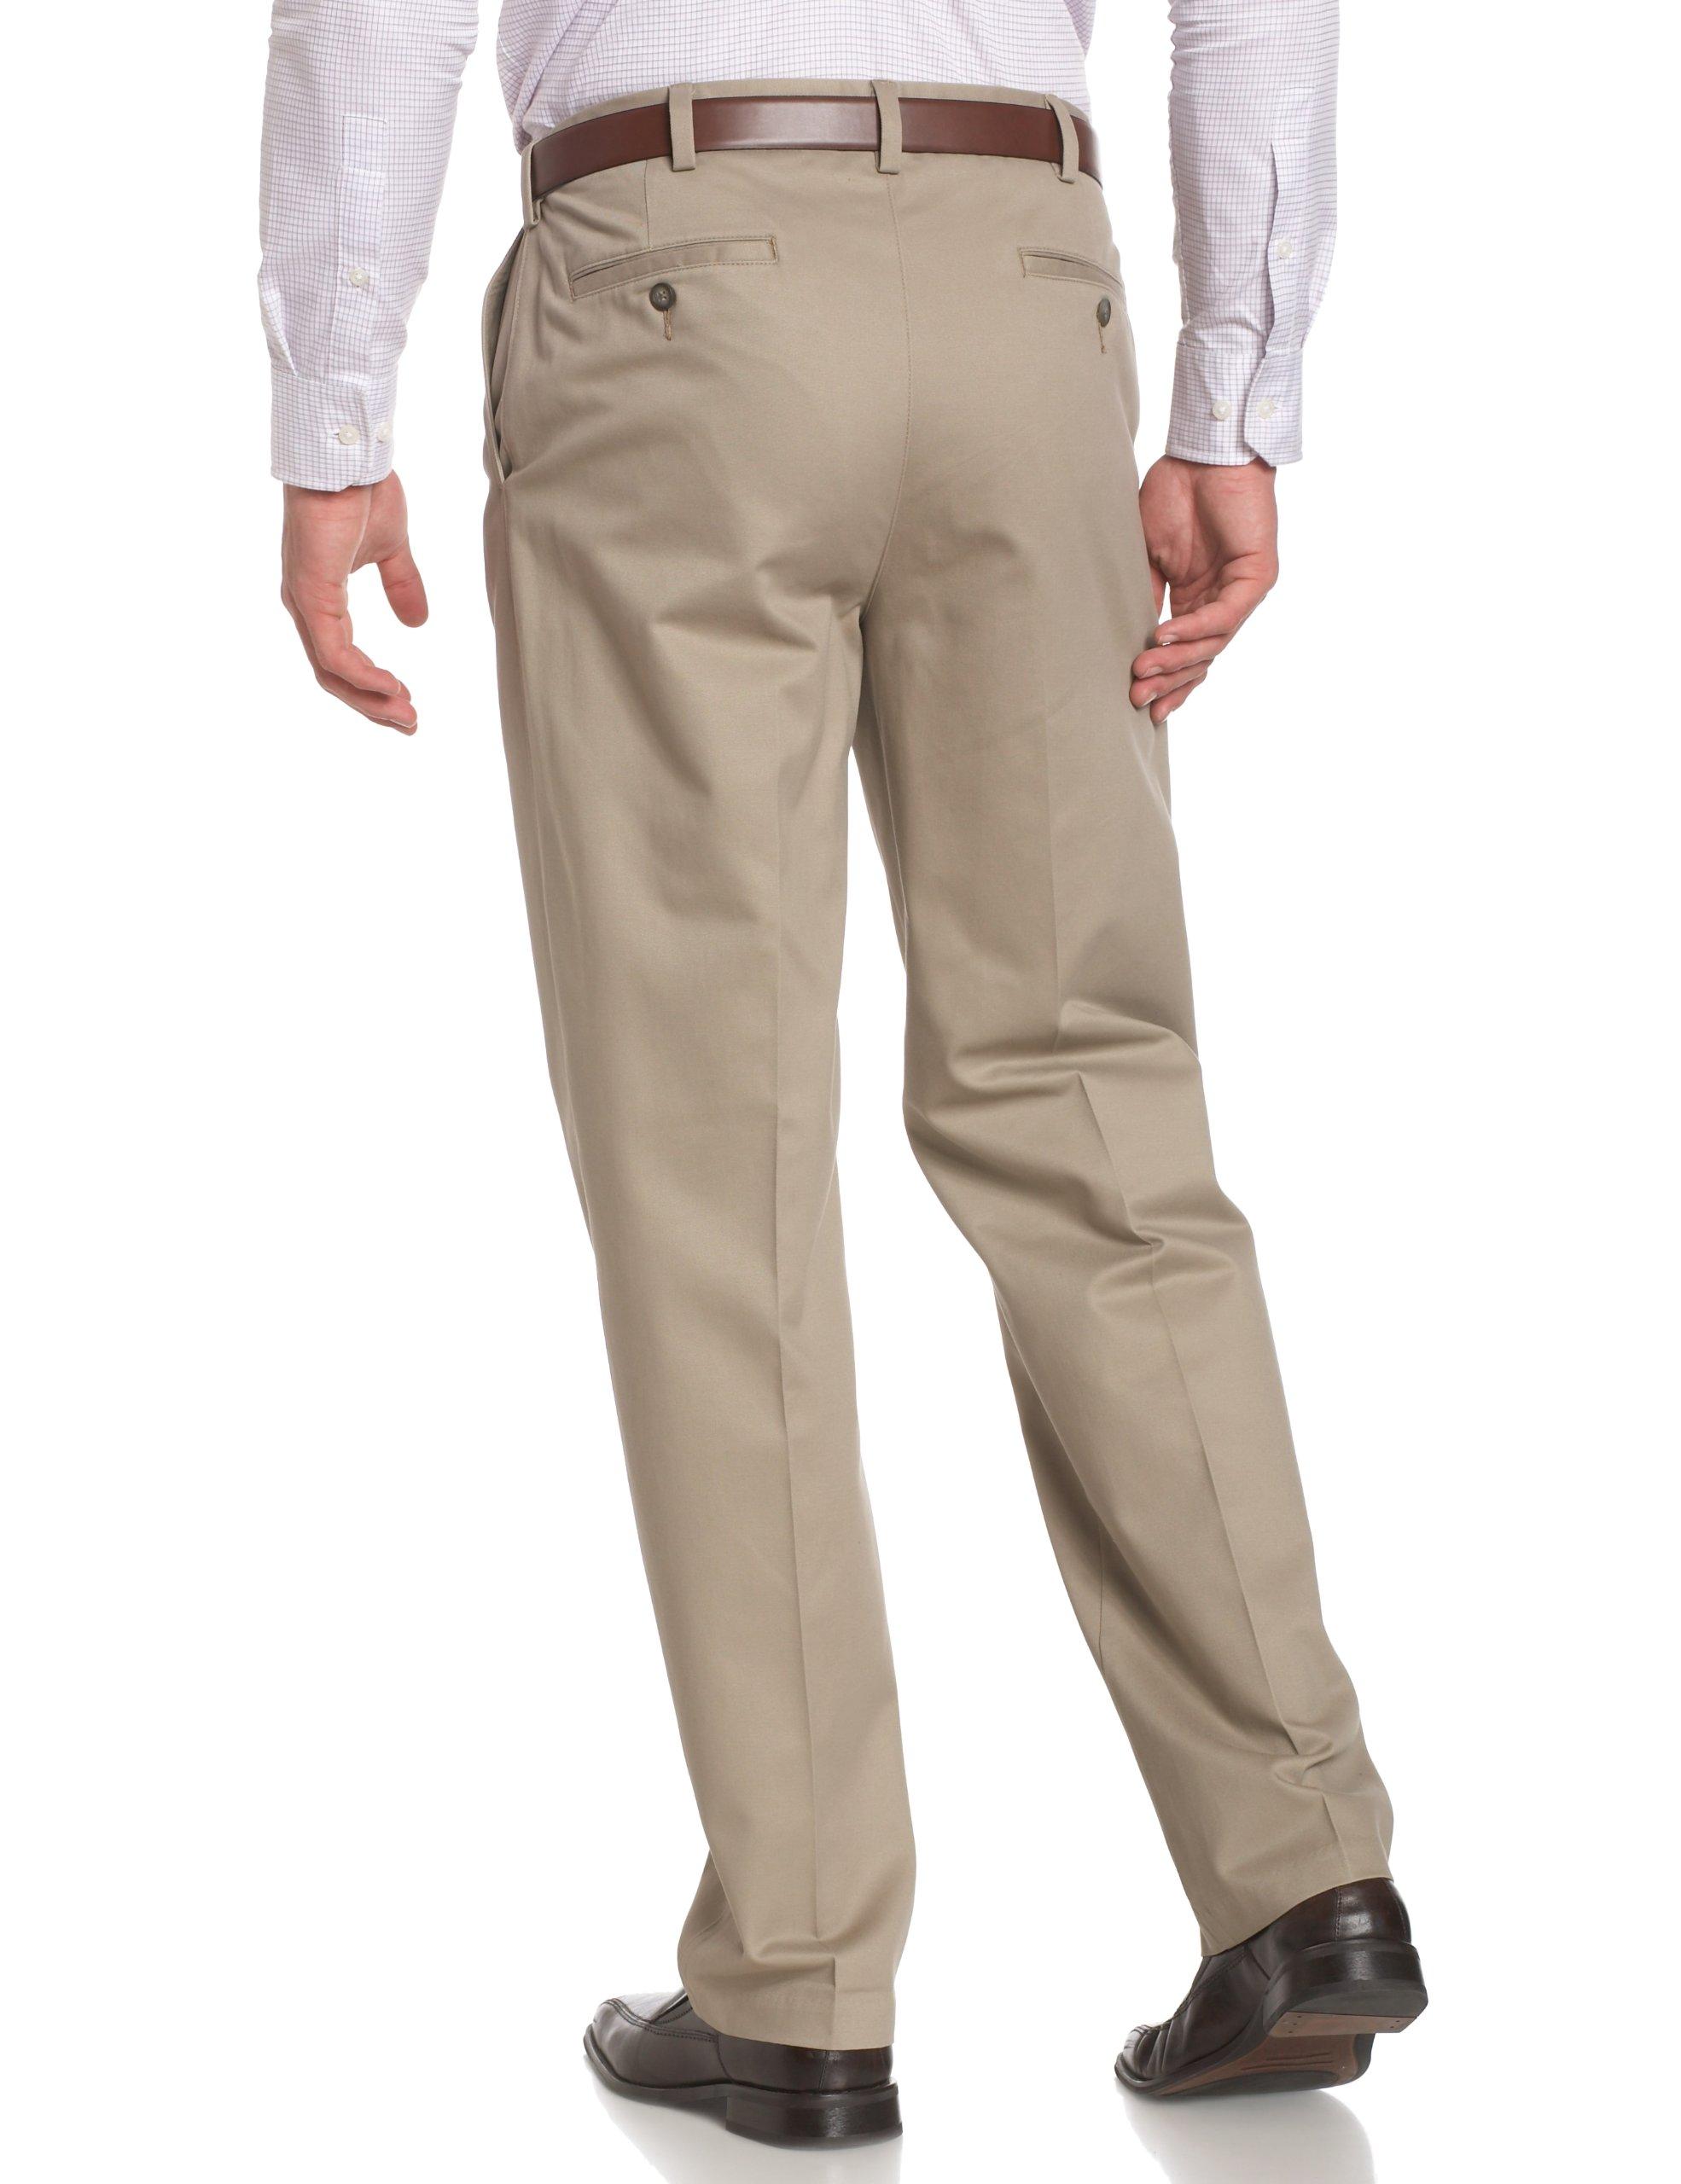 Savane Men's Pleated Wrinkle Free Twill,Khaki,42W 32L by Savane (Image #2)